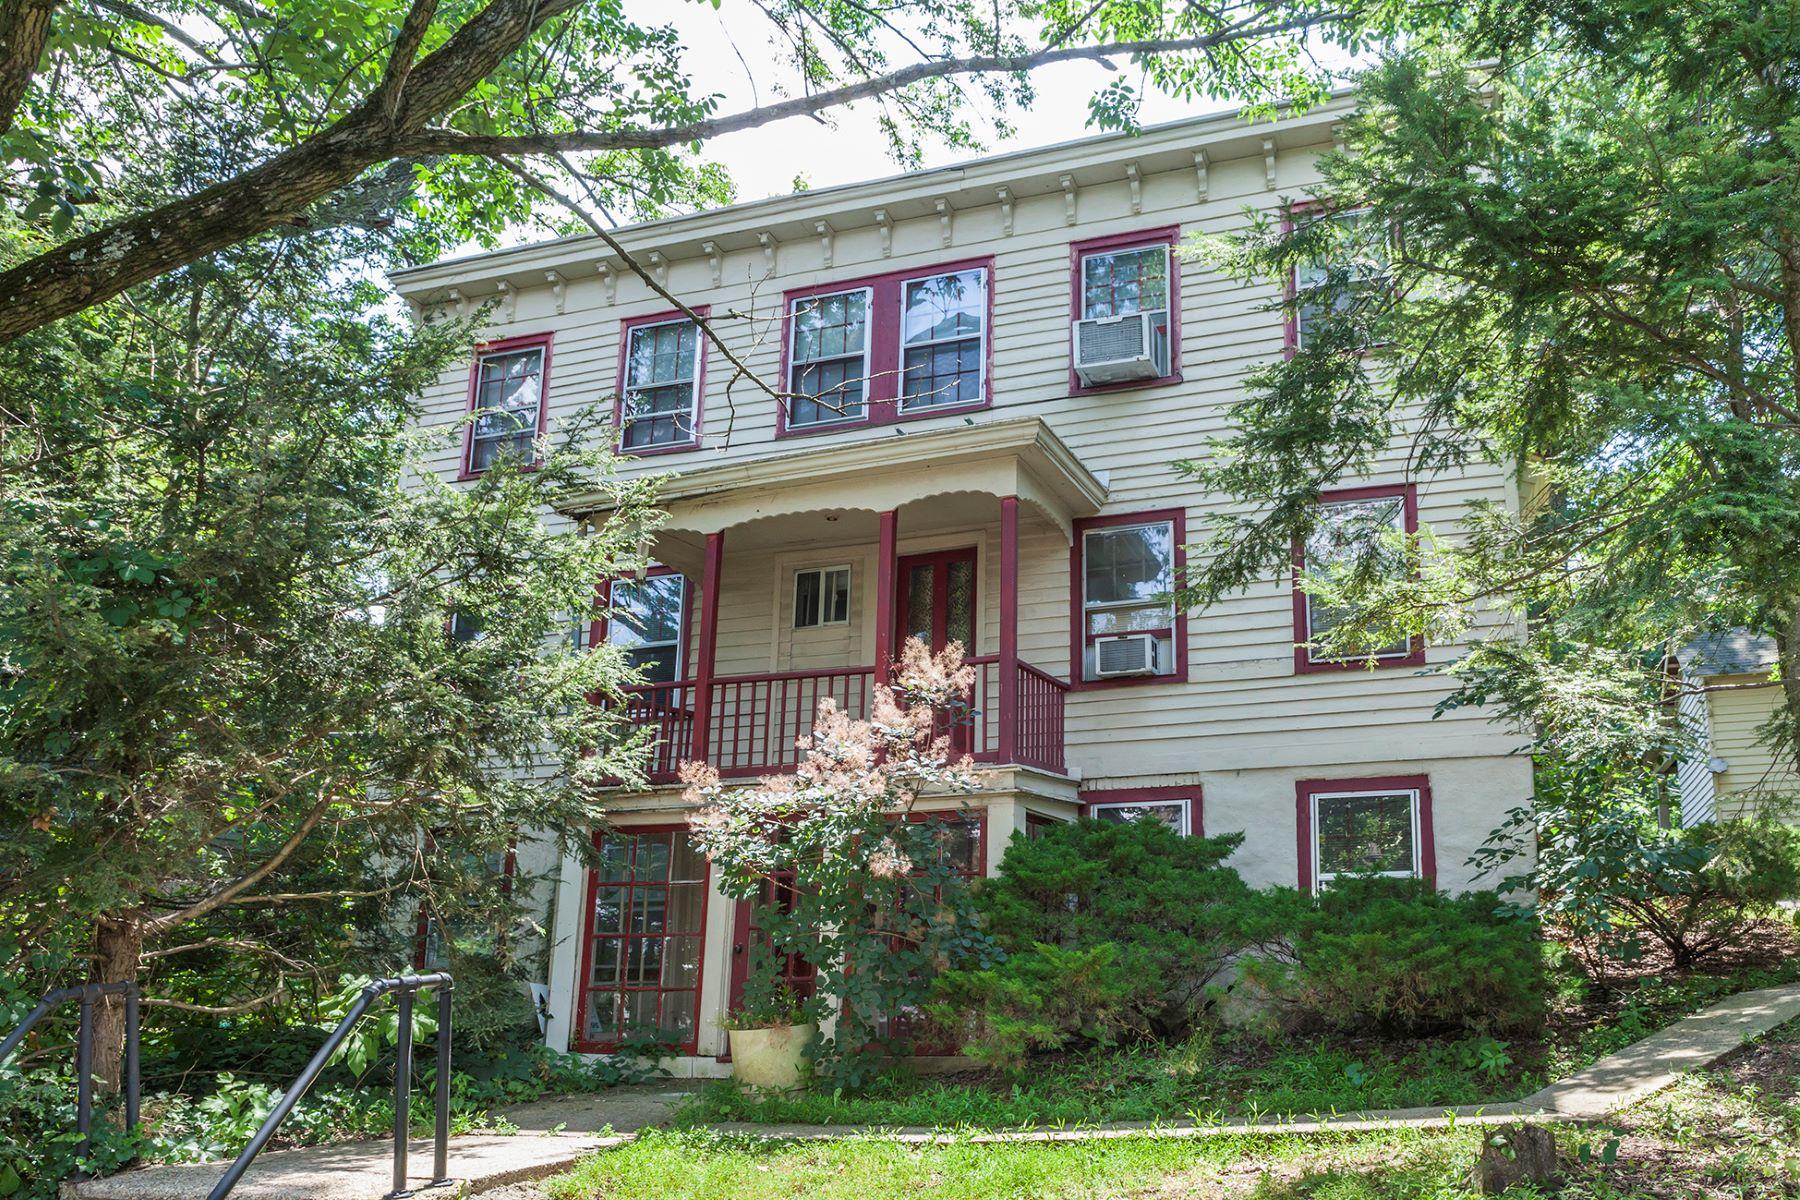 Maison multifamiliale pour l Vente à Be A Landlord - Hopewell Boro 65-67 West Broad Street Hopewell, New Jersey, 08525 États-Unis